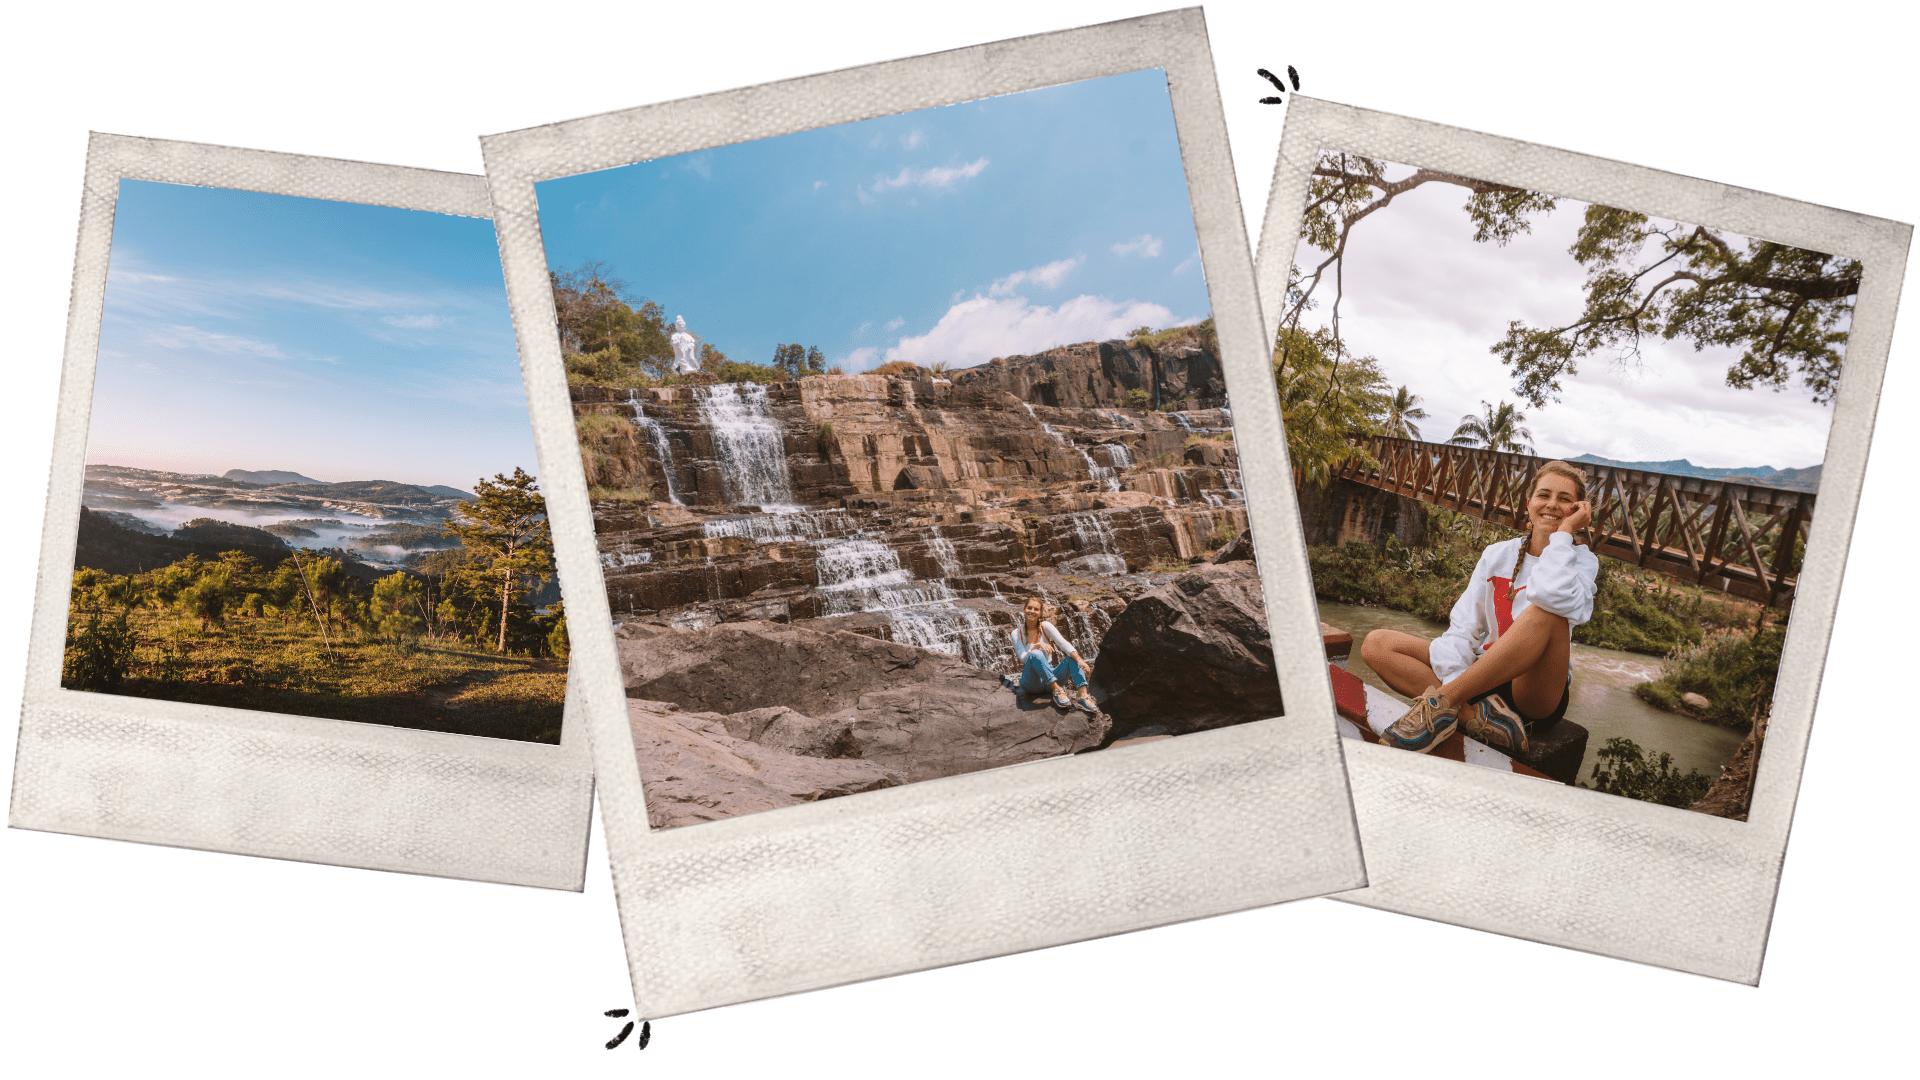 things to do in dalat wanderlist waterfalls cloud hunting